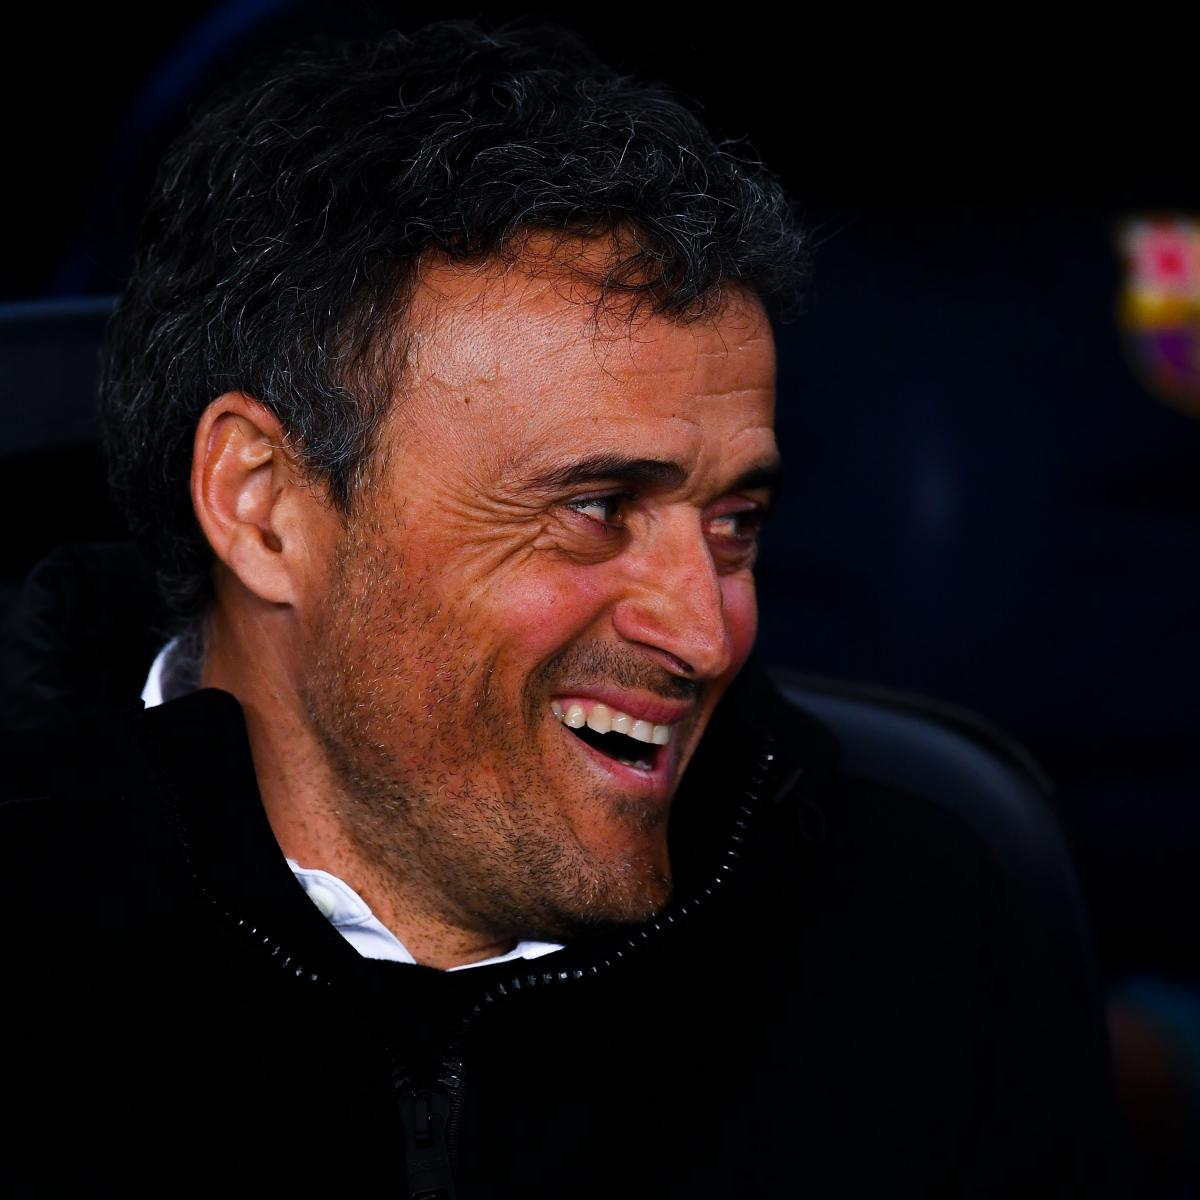 Celta Vigo Vs Barcelona Predictions Today: Barcelona Vs. Celta Vigo: Team News, Preview, Live Stream